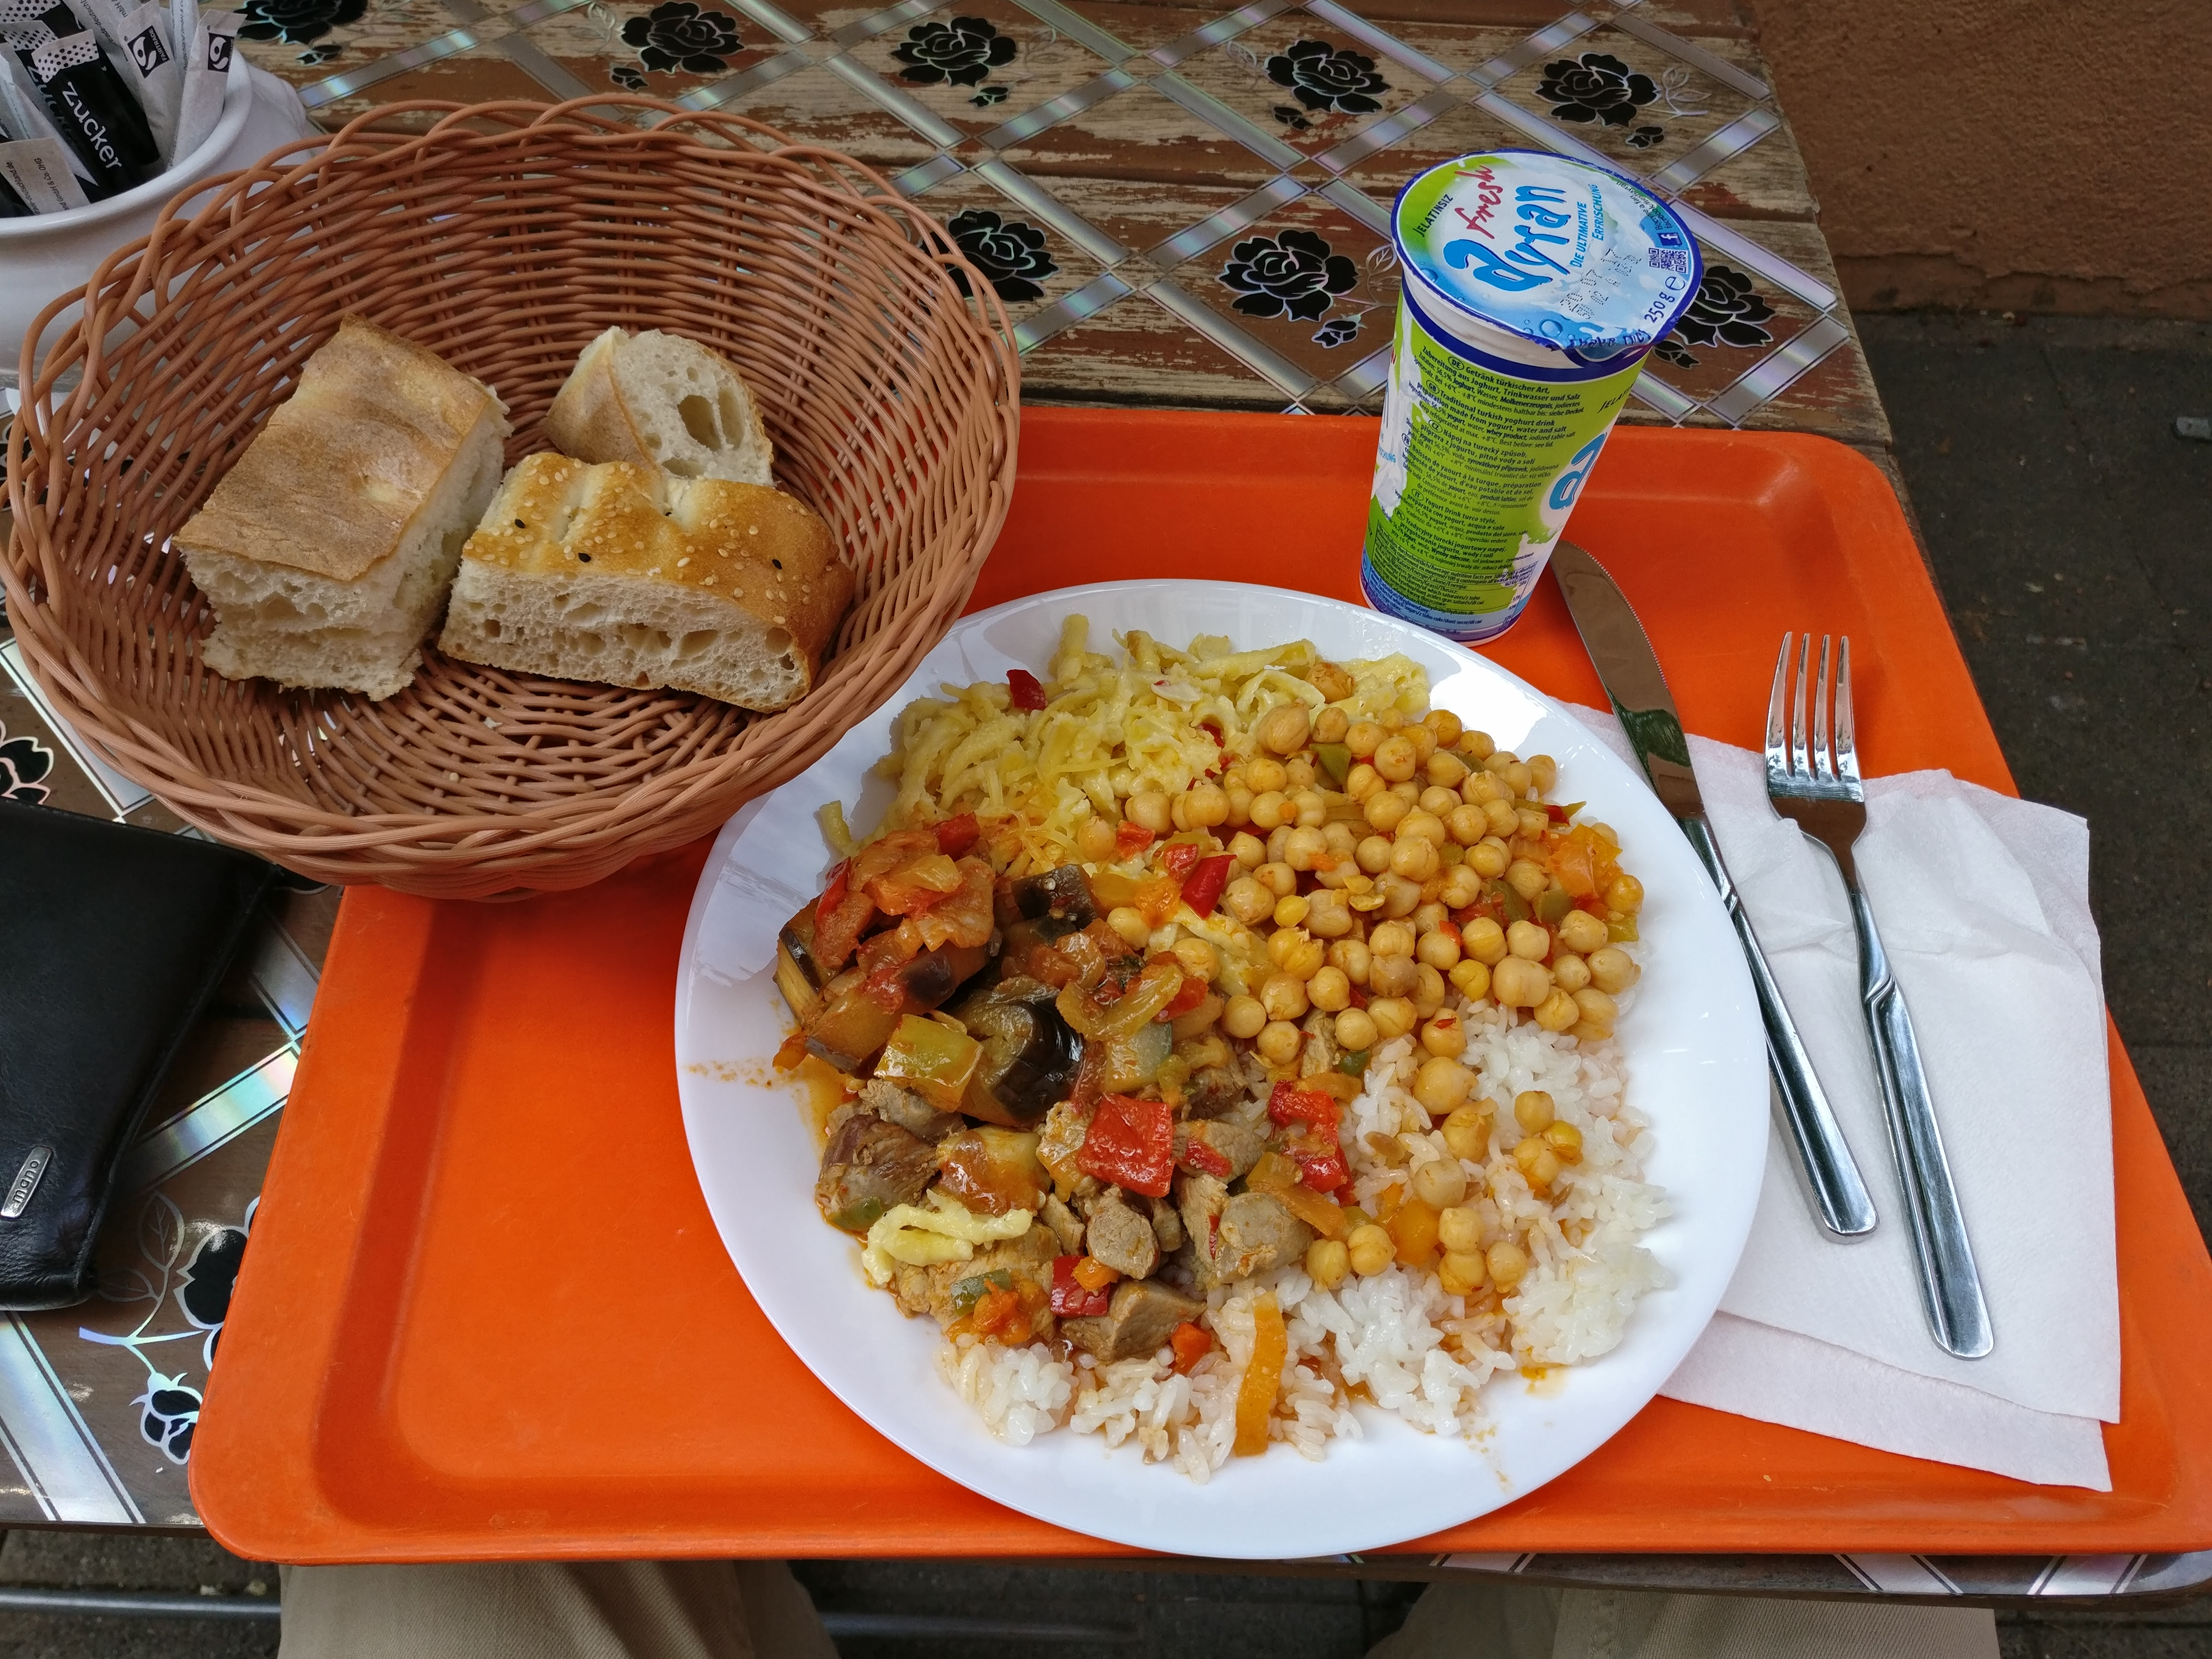 https://foodloader.net/nico_2017-06-02_reis-fleisch-nudeln-gemuese-kichererbsen-brot.jpg